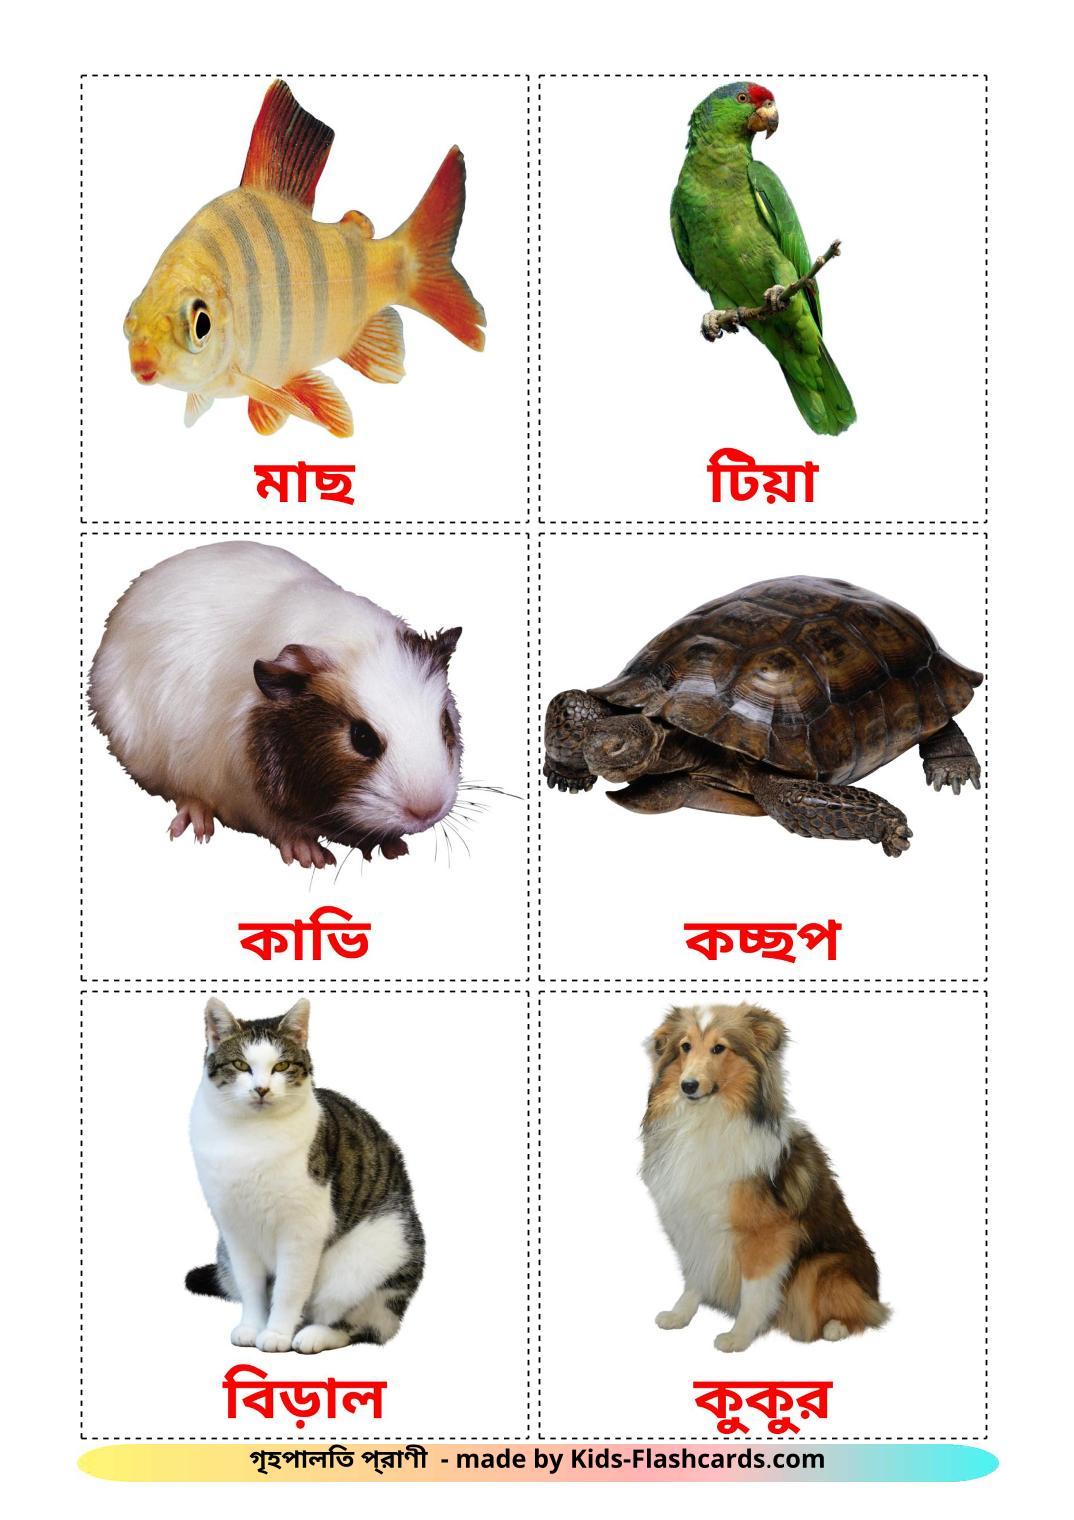 Domestic animals - 10 Free Printable bengali Flashcards